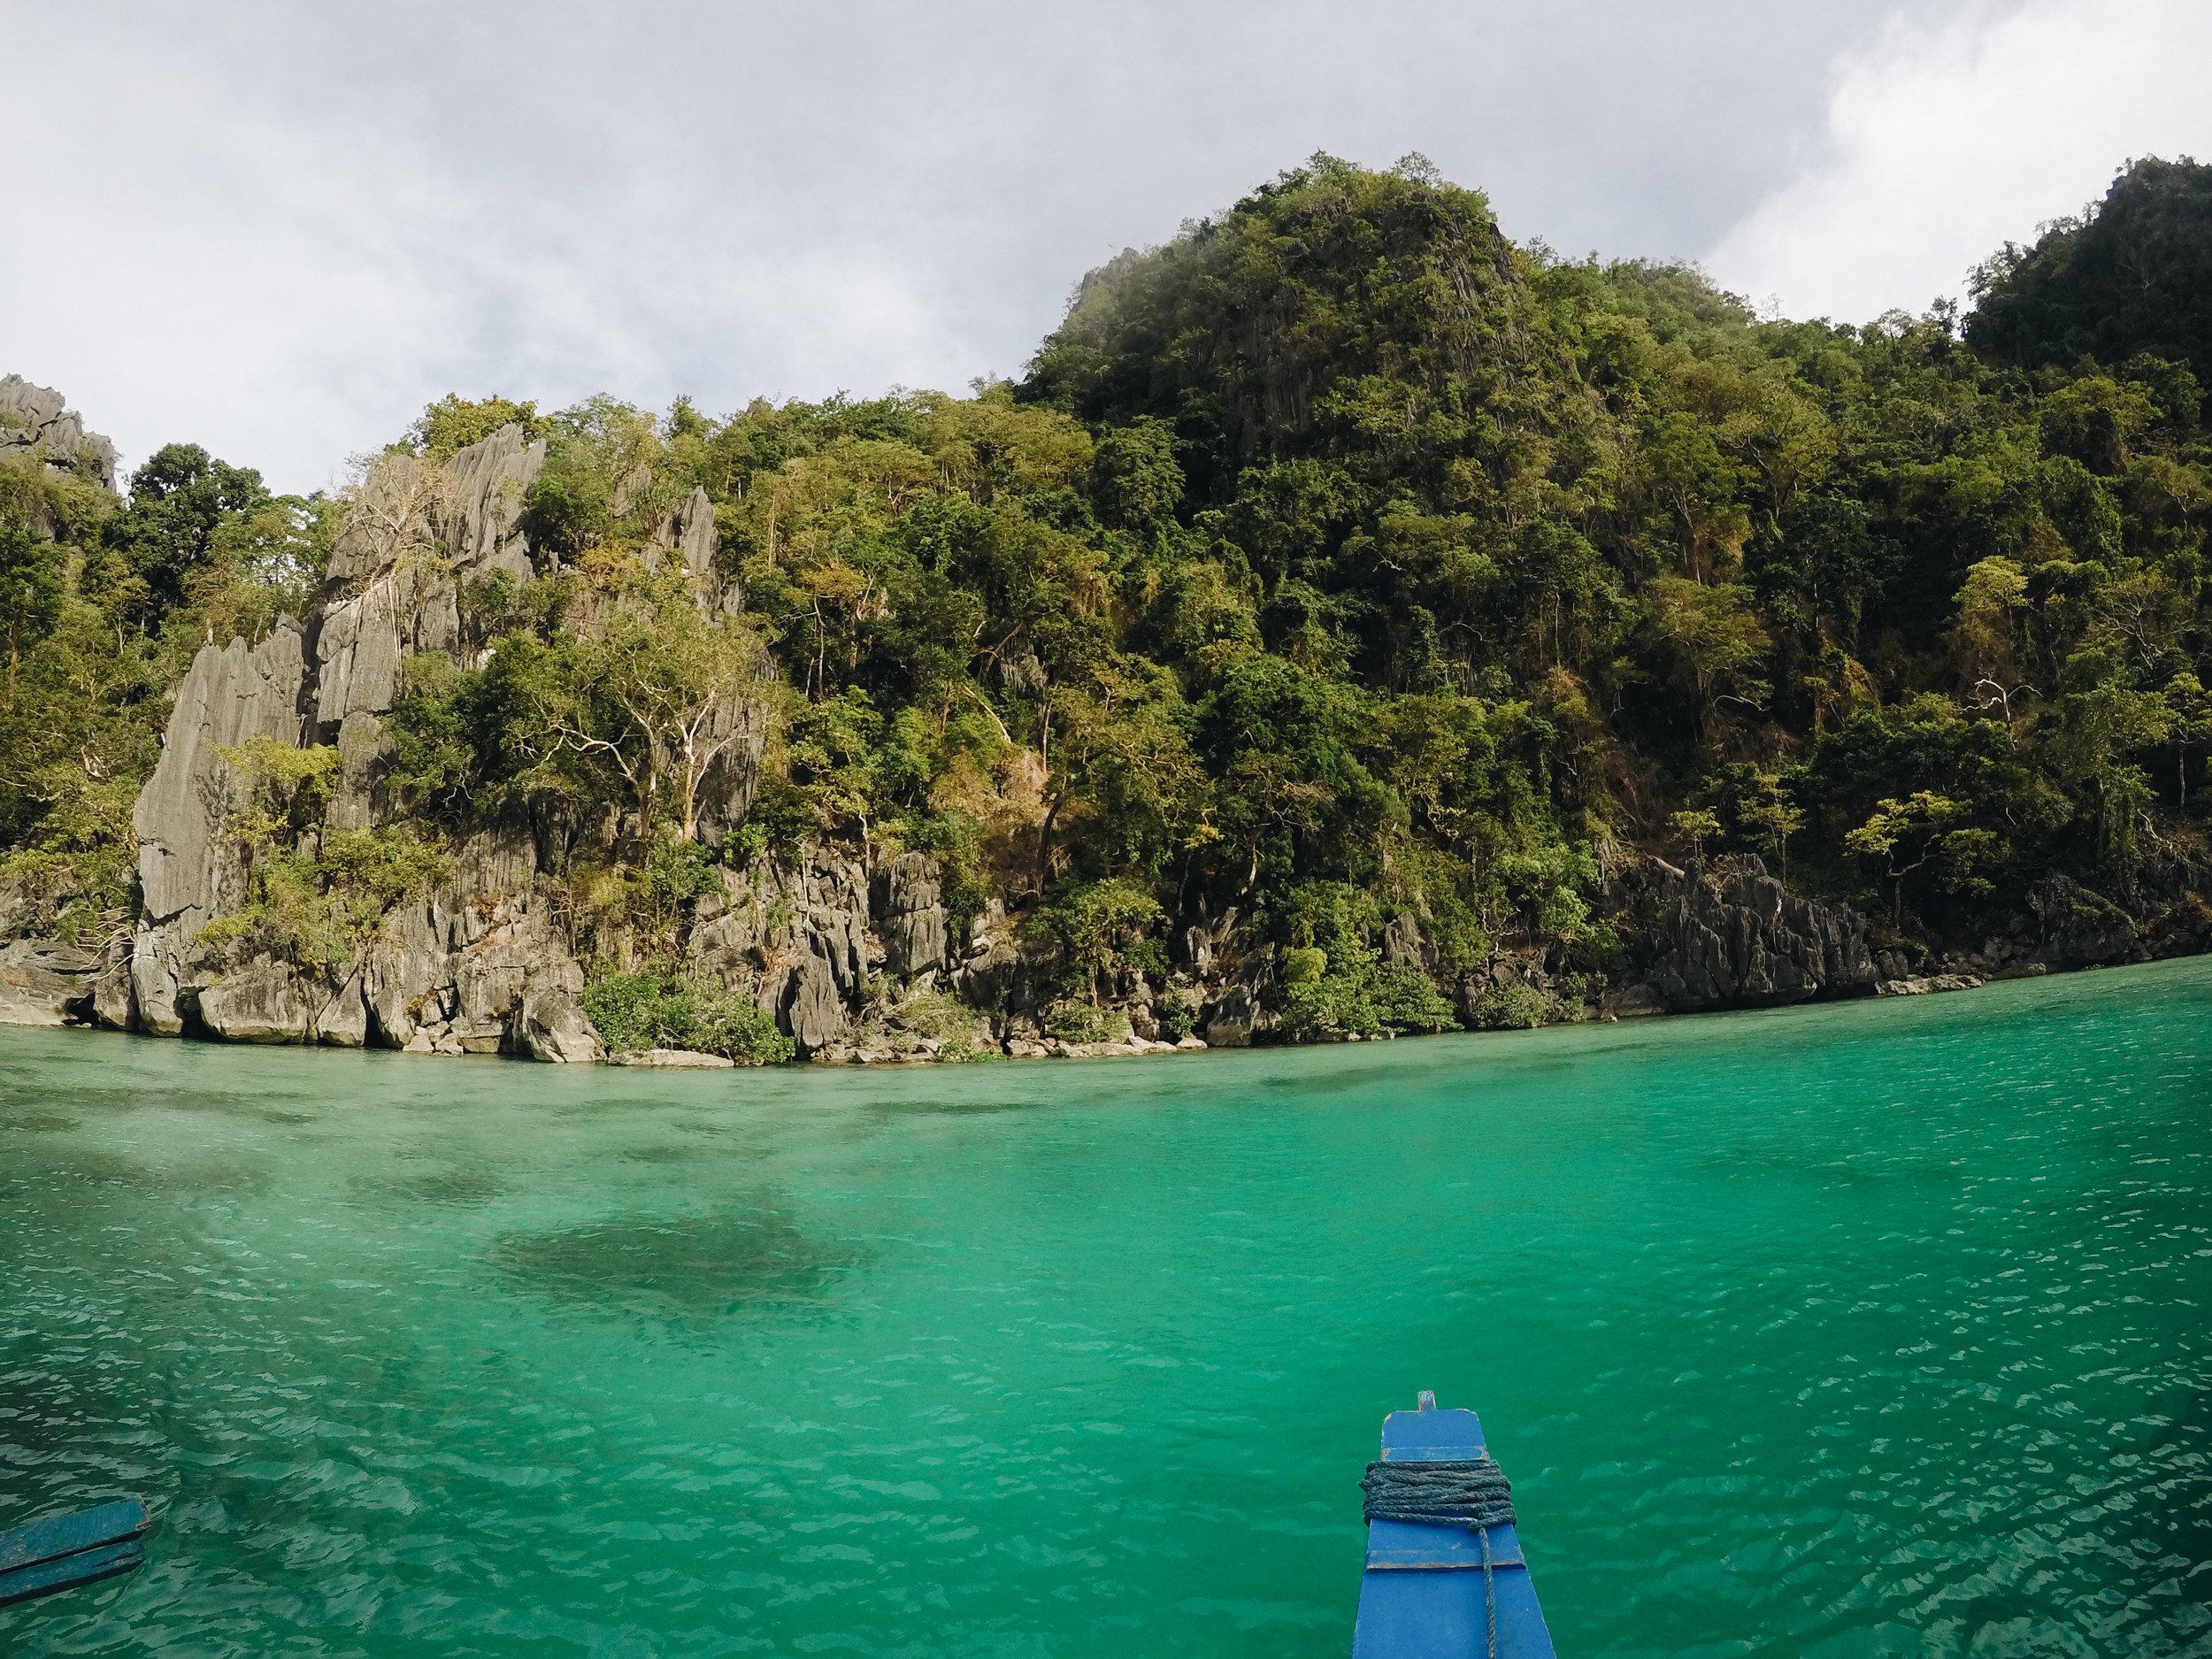 coron-island-hopping-philippines-palawan.jpg